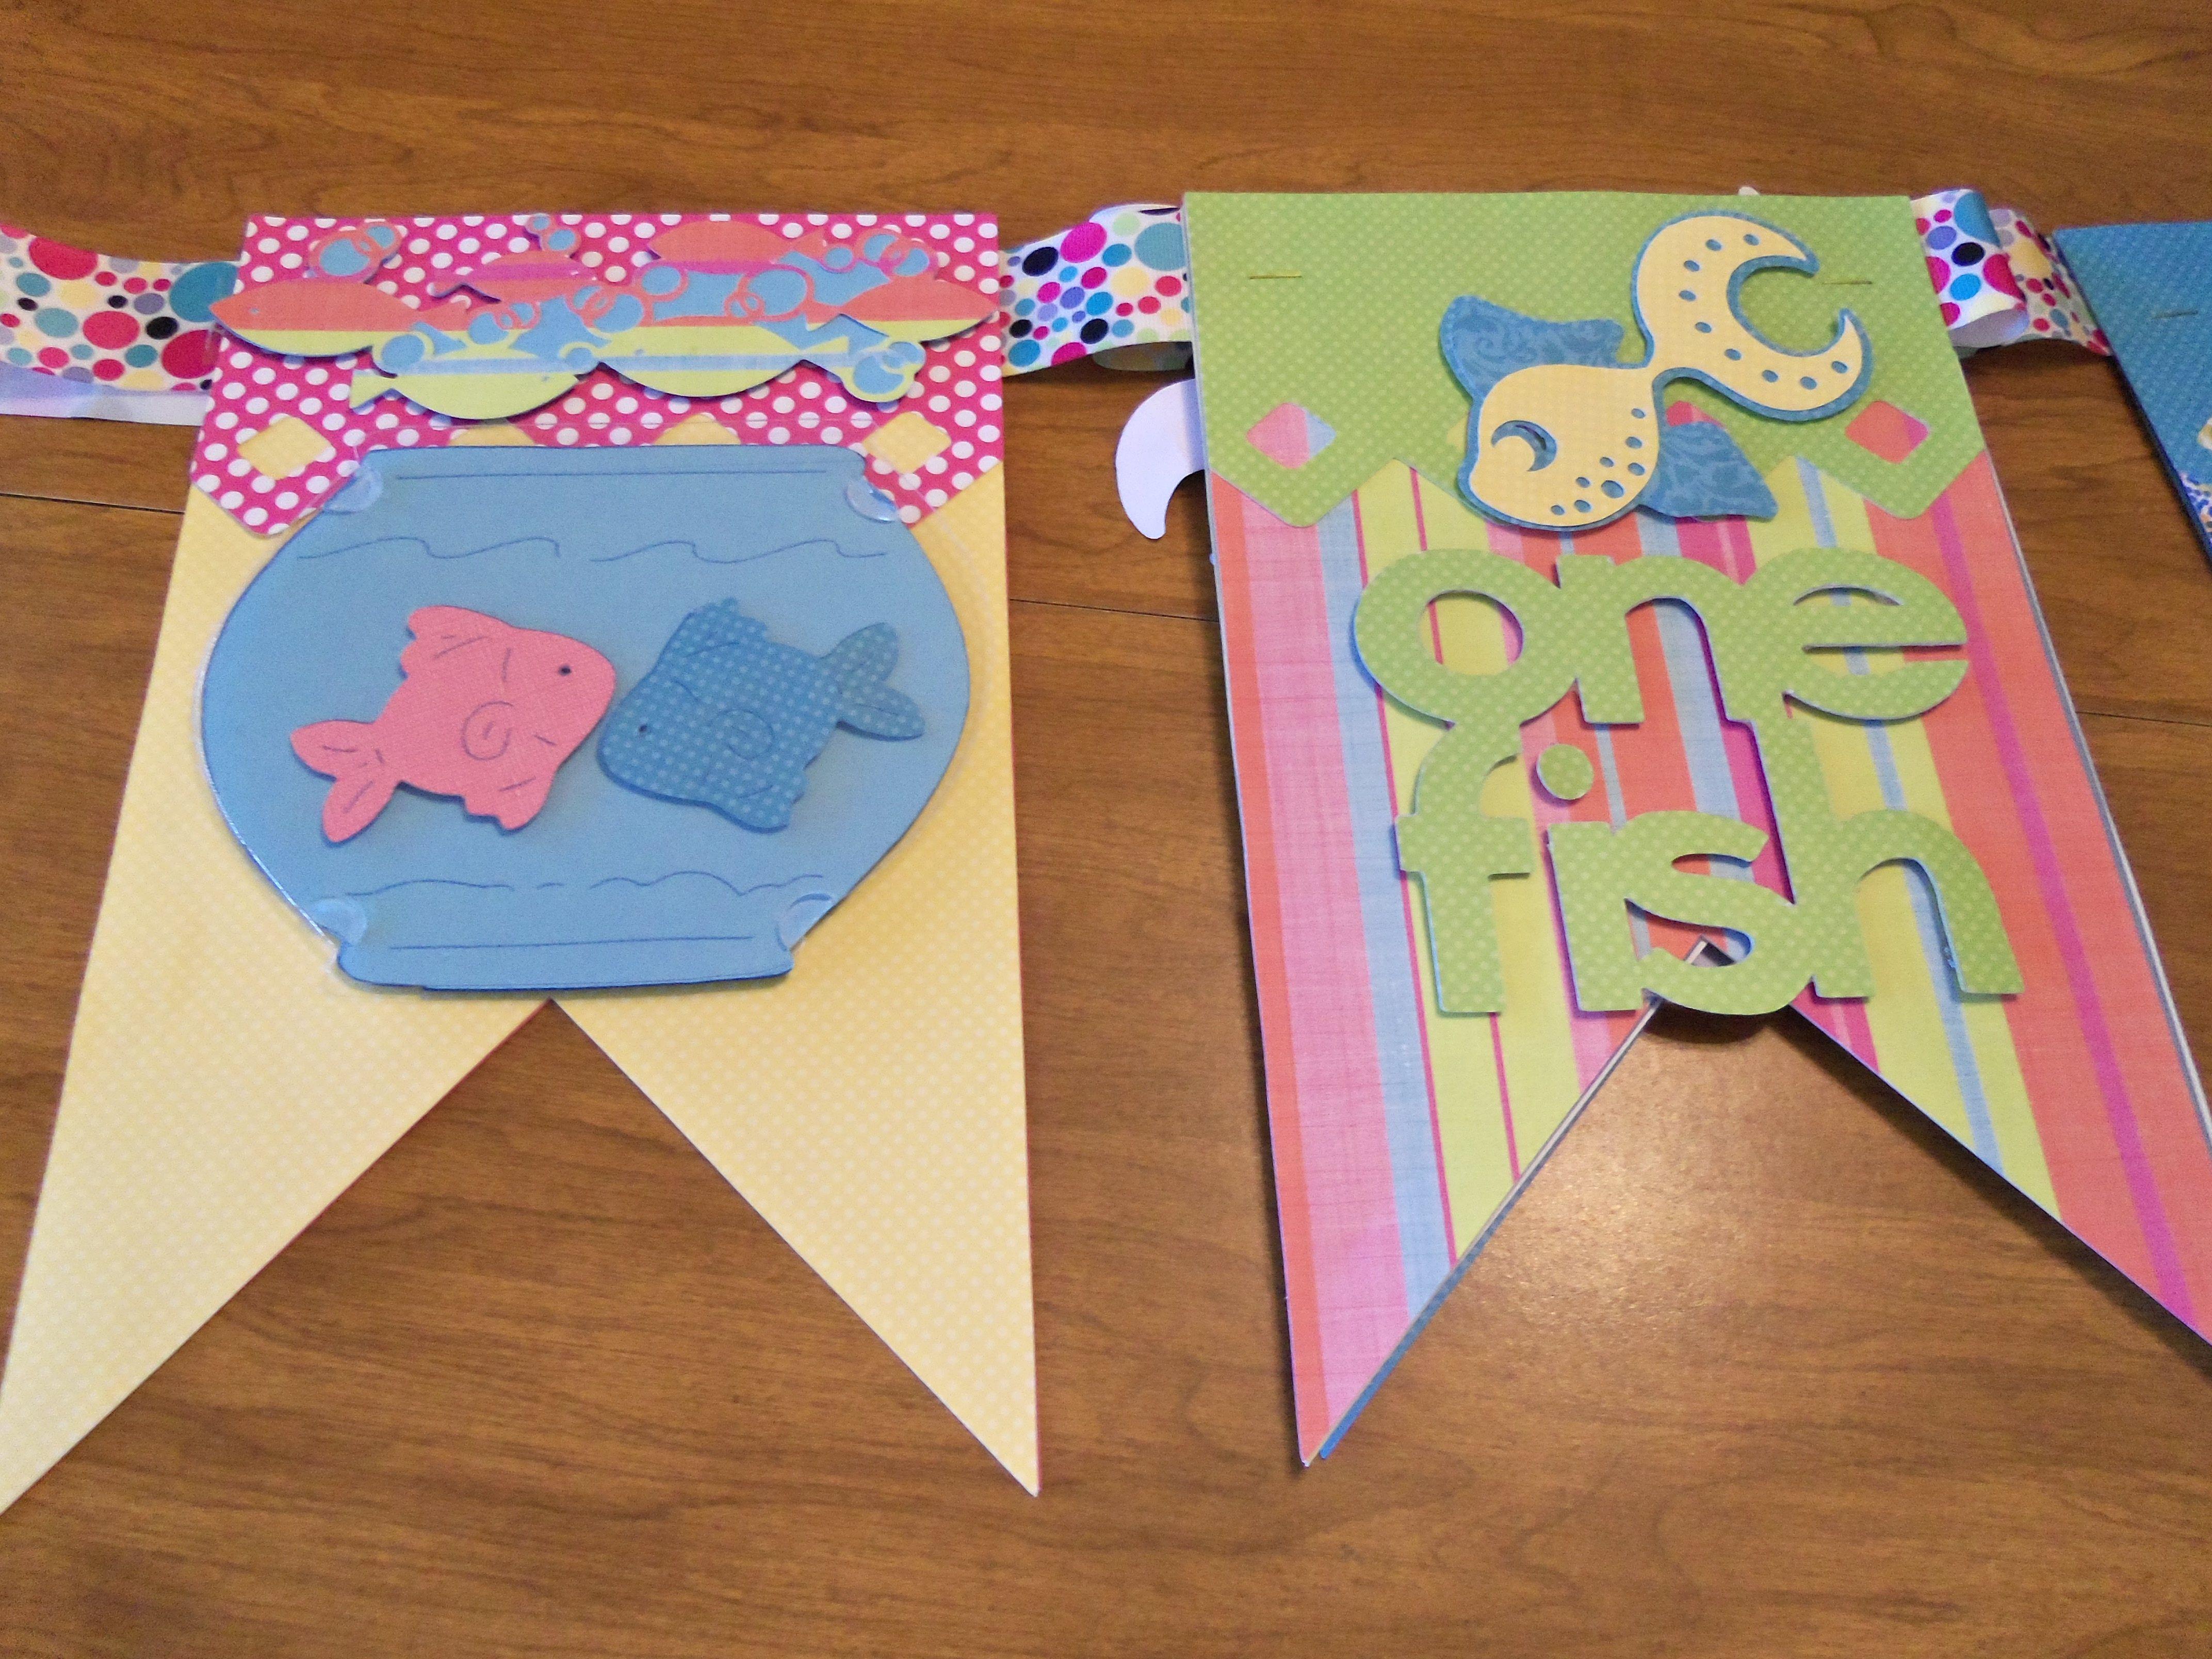 Baby banner   Scrapbook crafts, Baby banners, Crafts